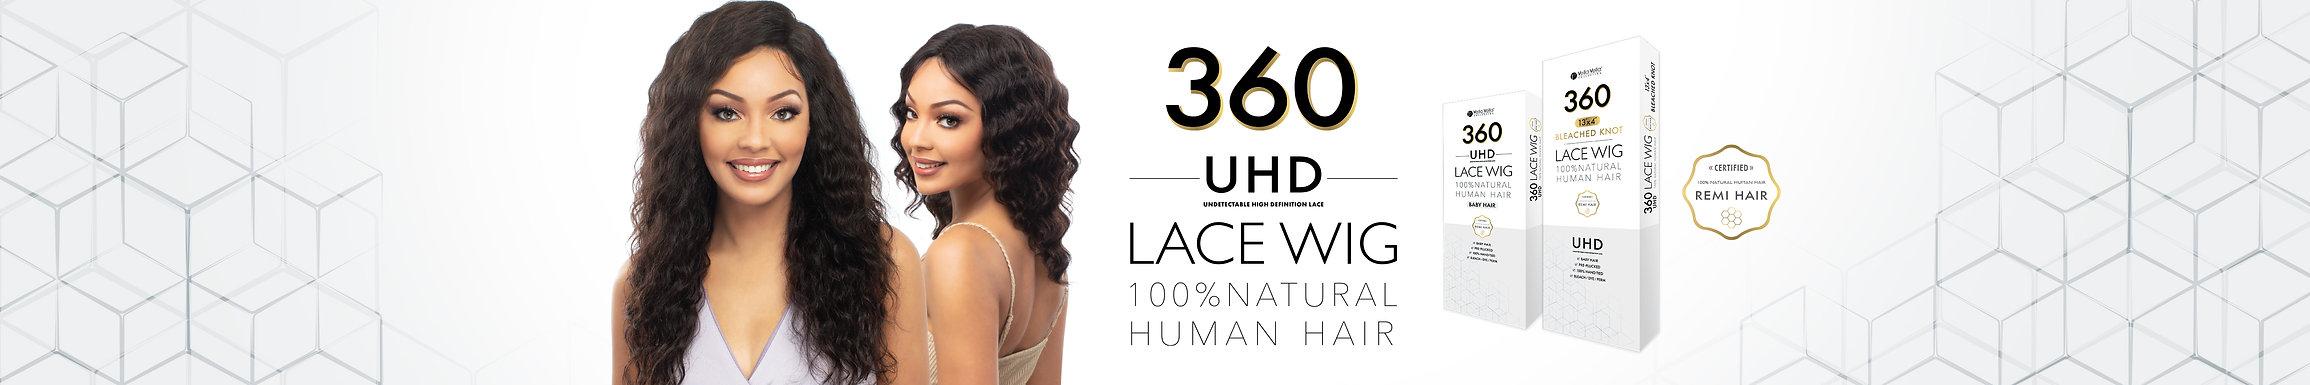 Natural_360 Lace wig.jpg